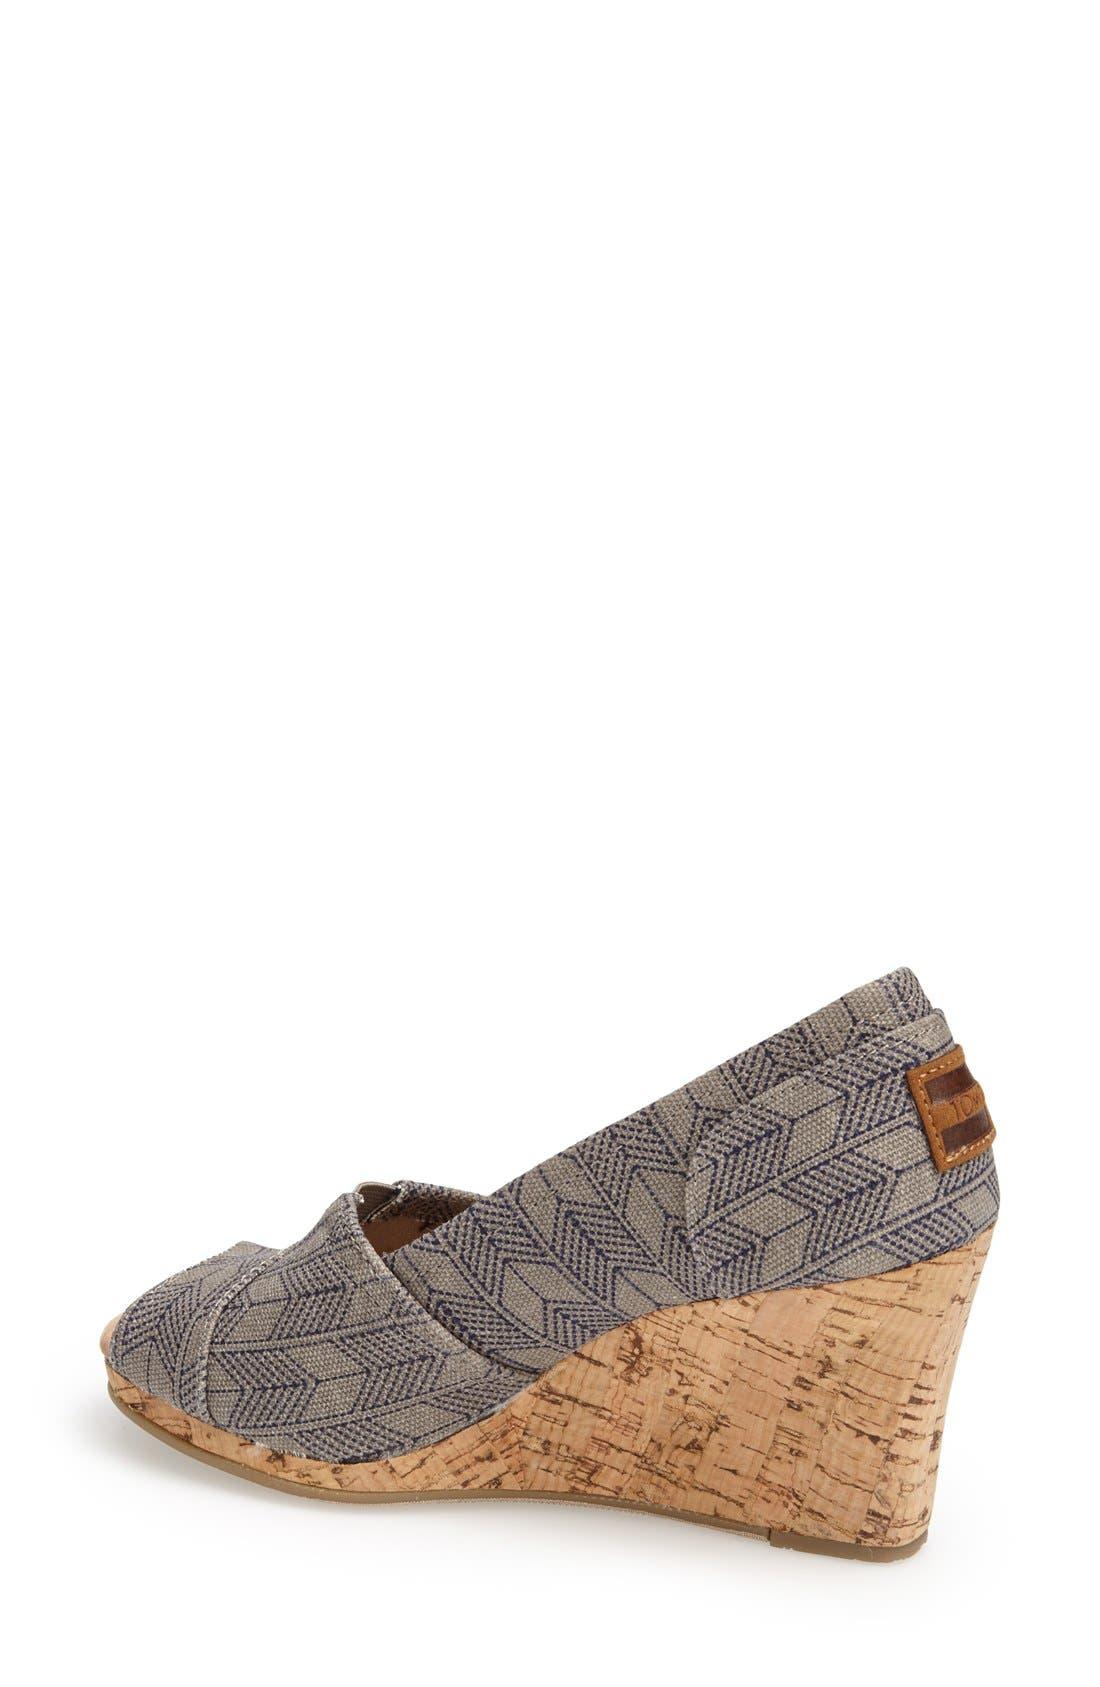 Alternate Image 2  - TOMS 'Classic - Shashiko' Woven Wedge Sandal (Women)